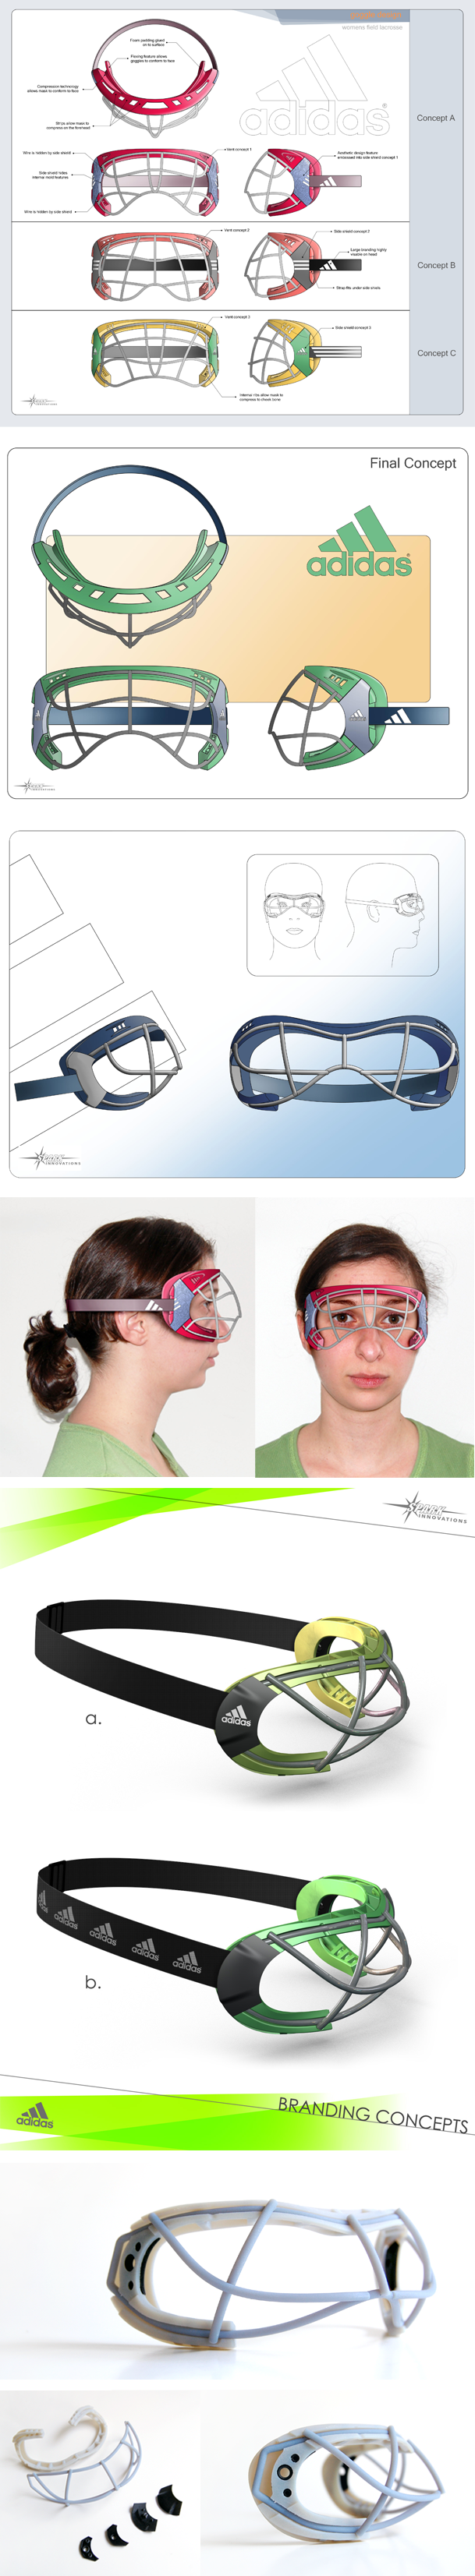 Inventor Help & Product Development: Adidas Women-Lacross-Goggles